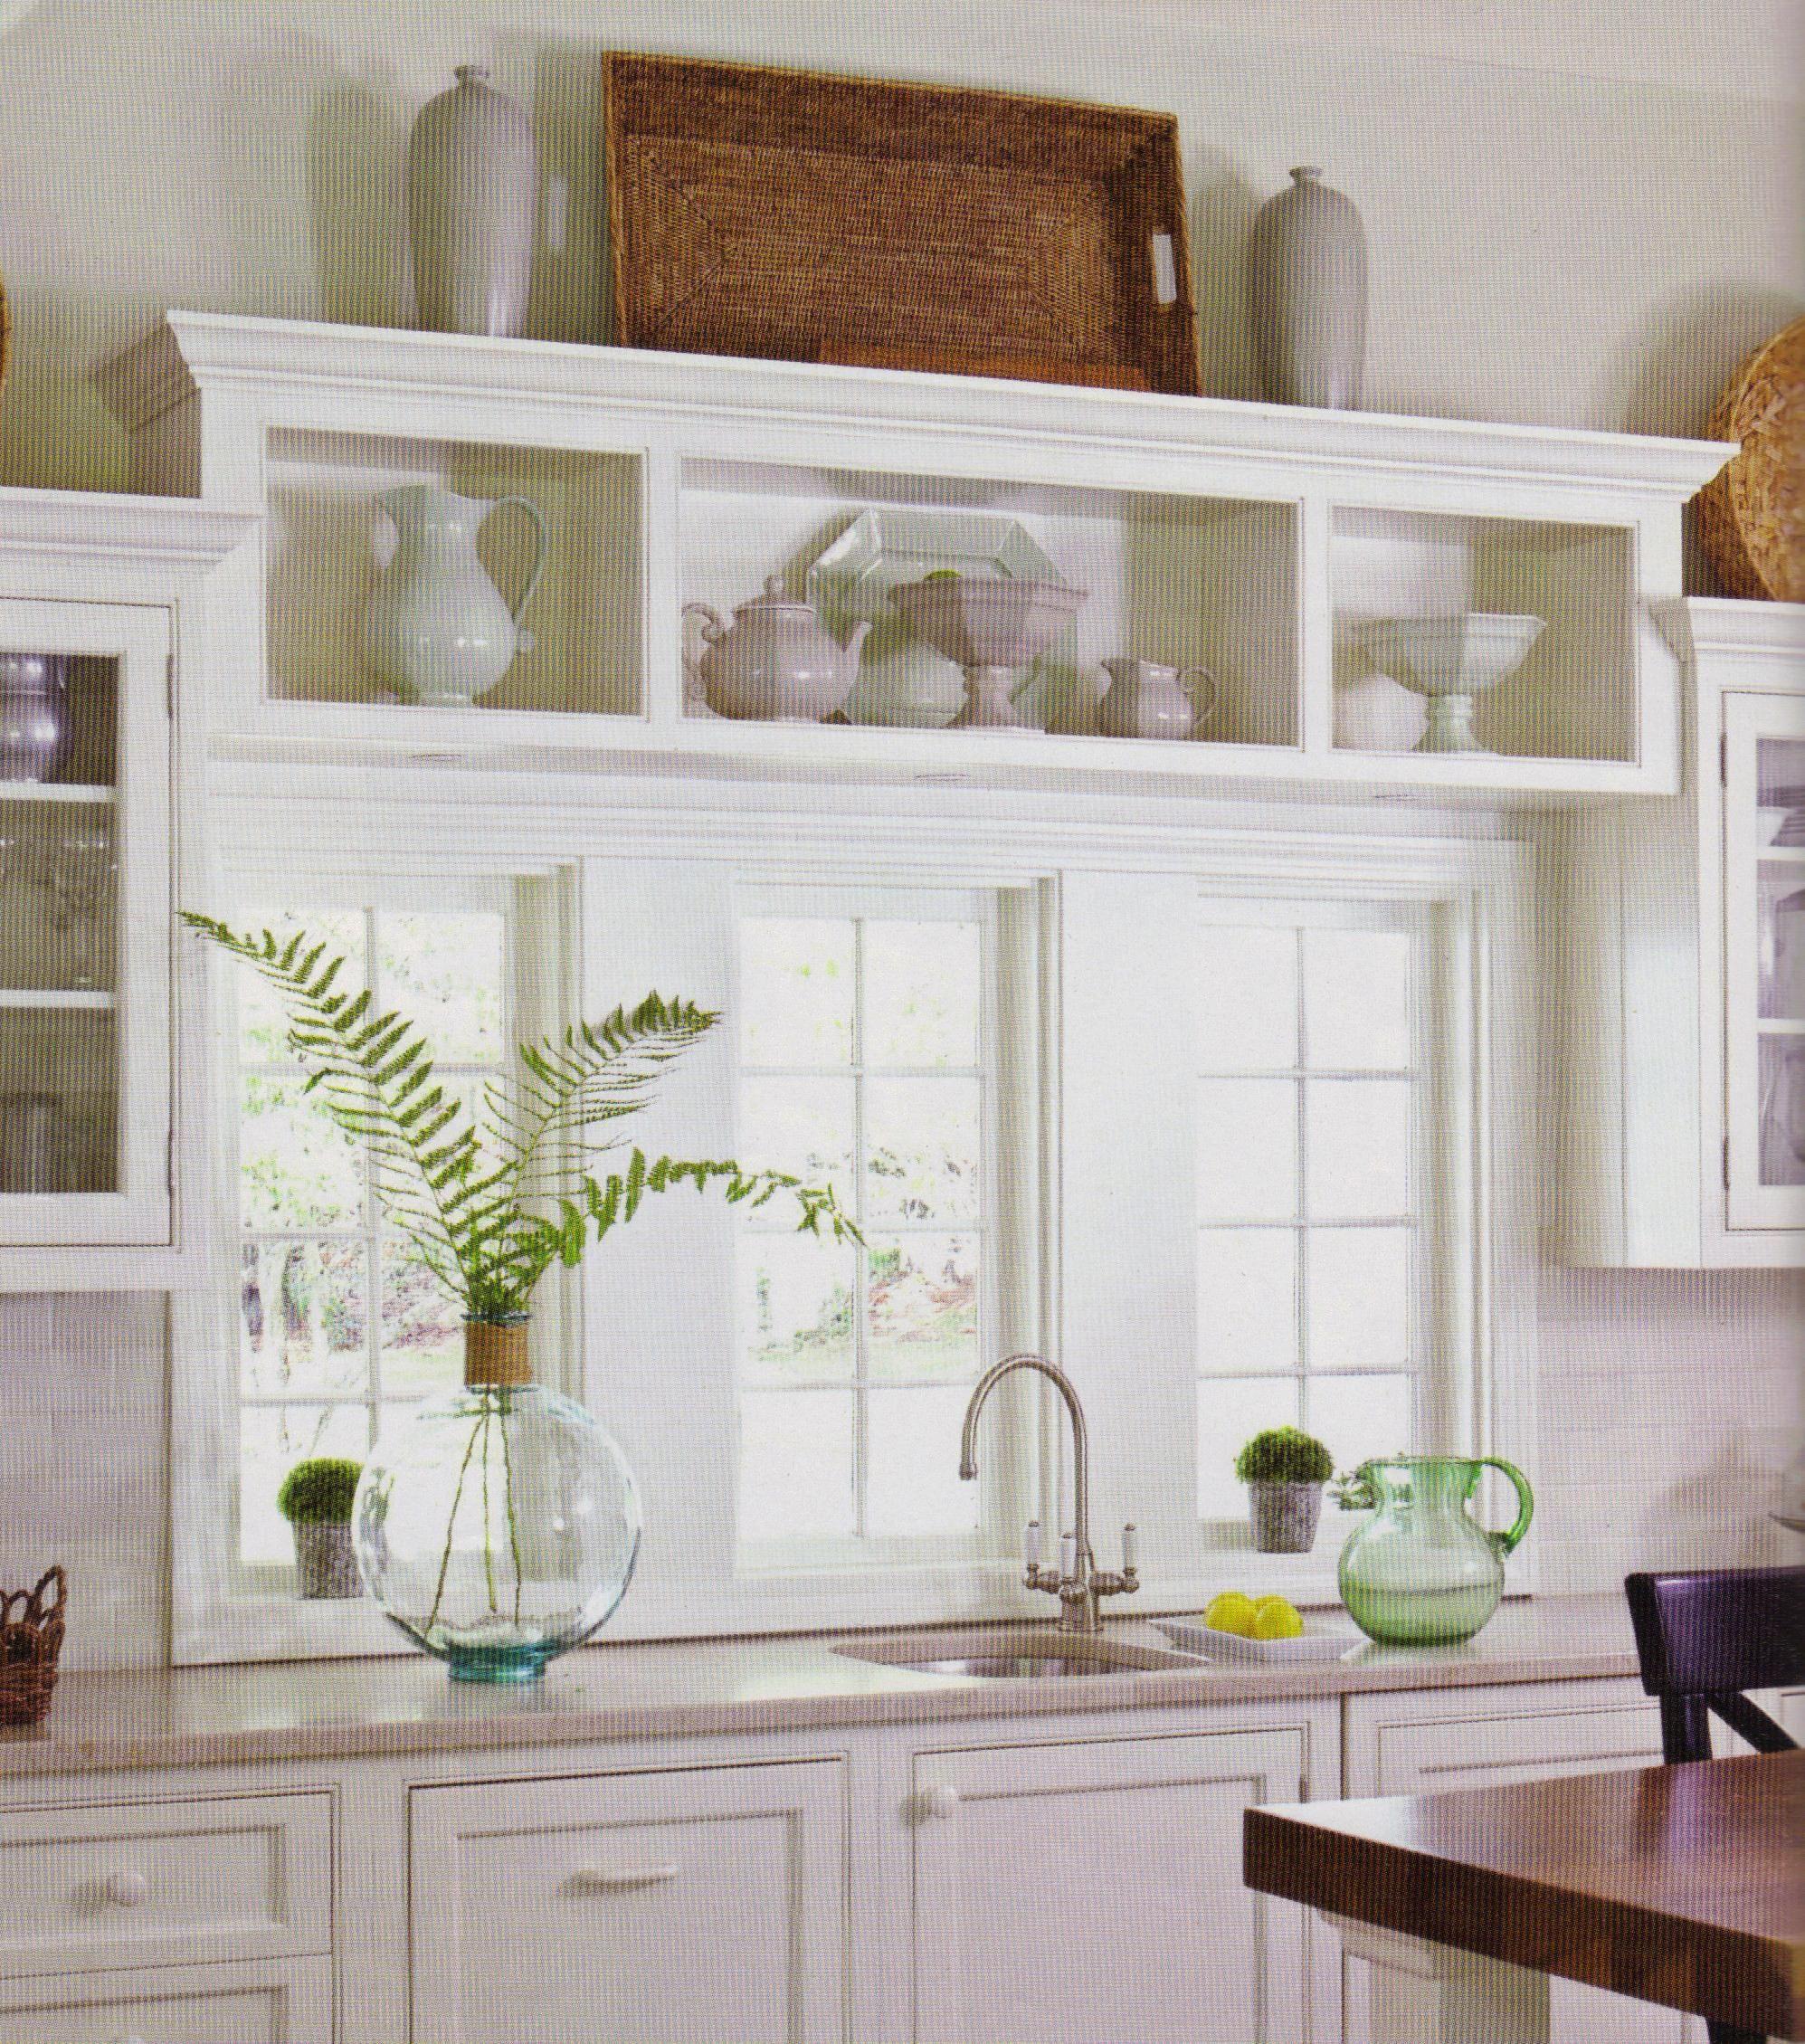 Kitchen Shelves Over Windows: Shelf Above Window Concept